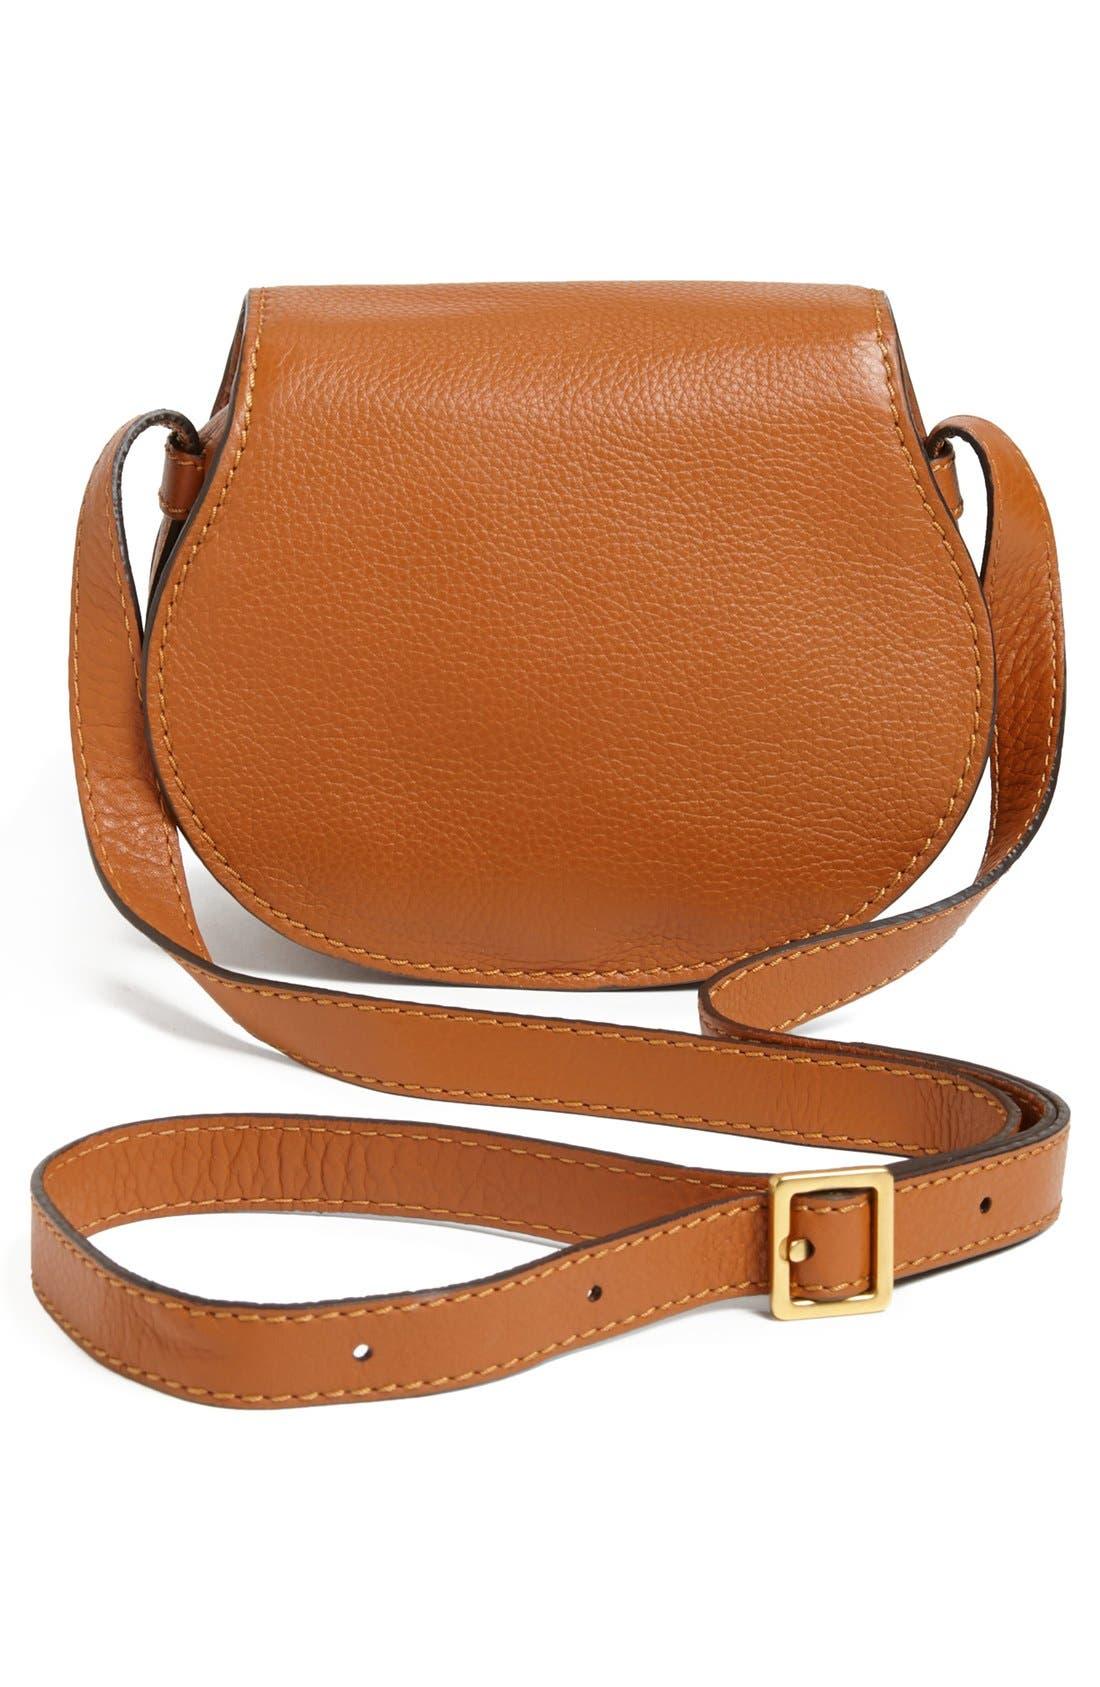 CHLOÉ, 'Mini Marcie' Leather Crossbody Bag, Alternate thumbnail 3, color, TAN GOLD HRDWRE